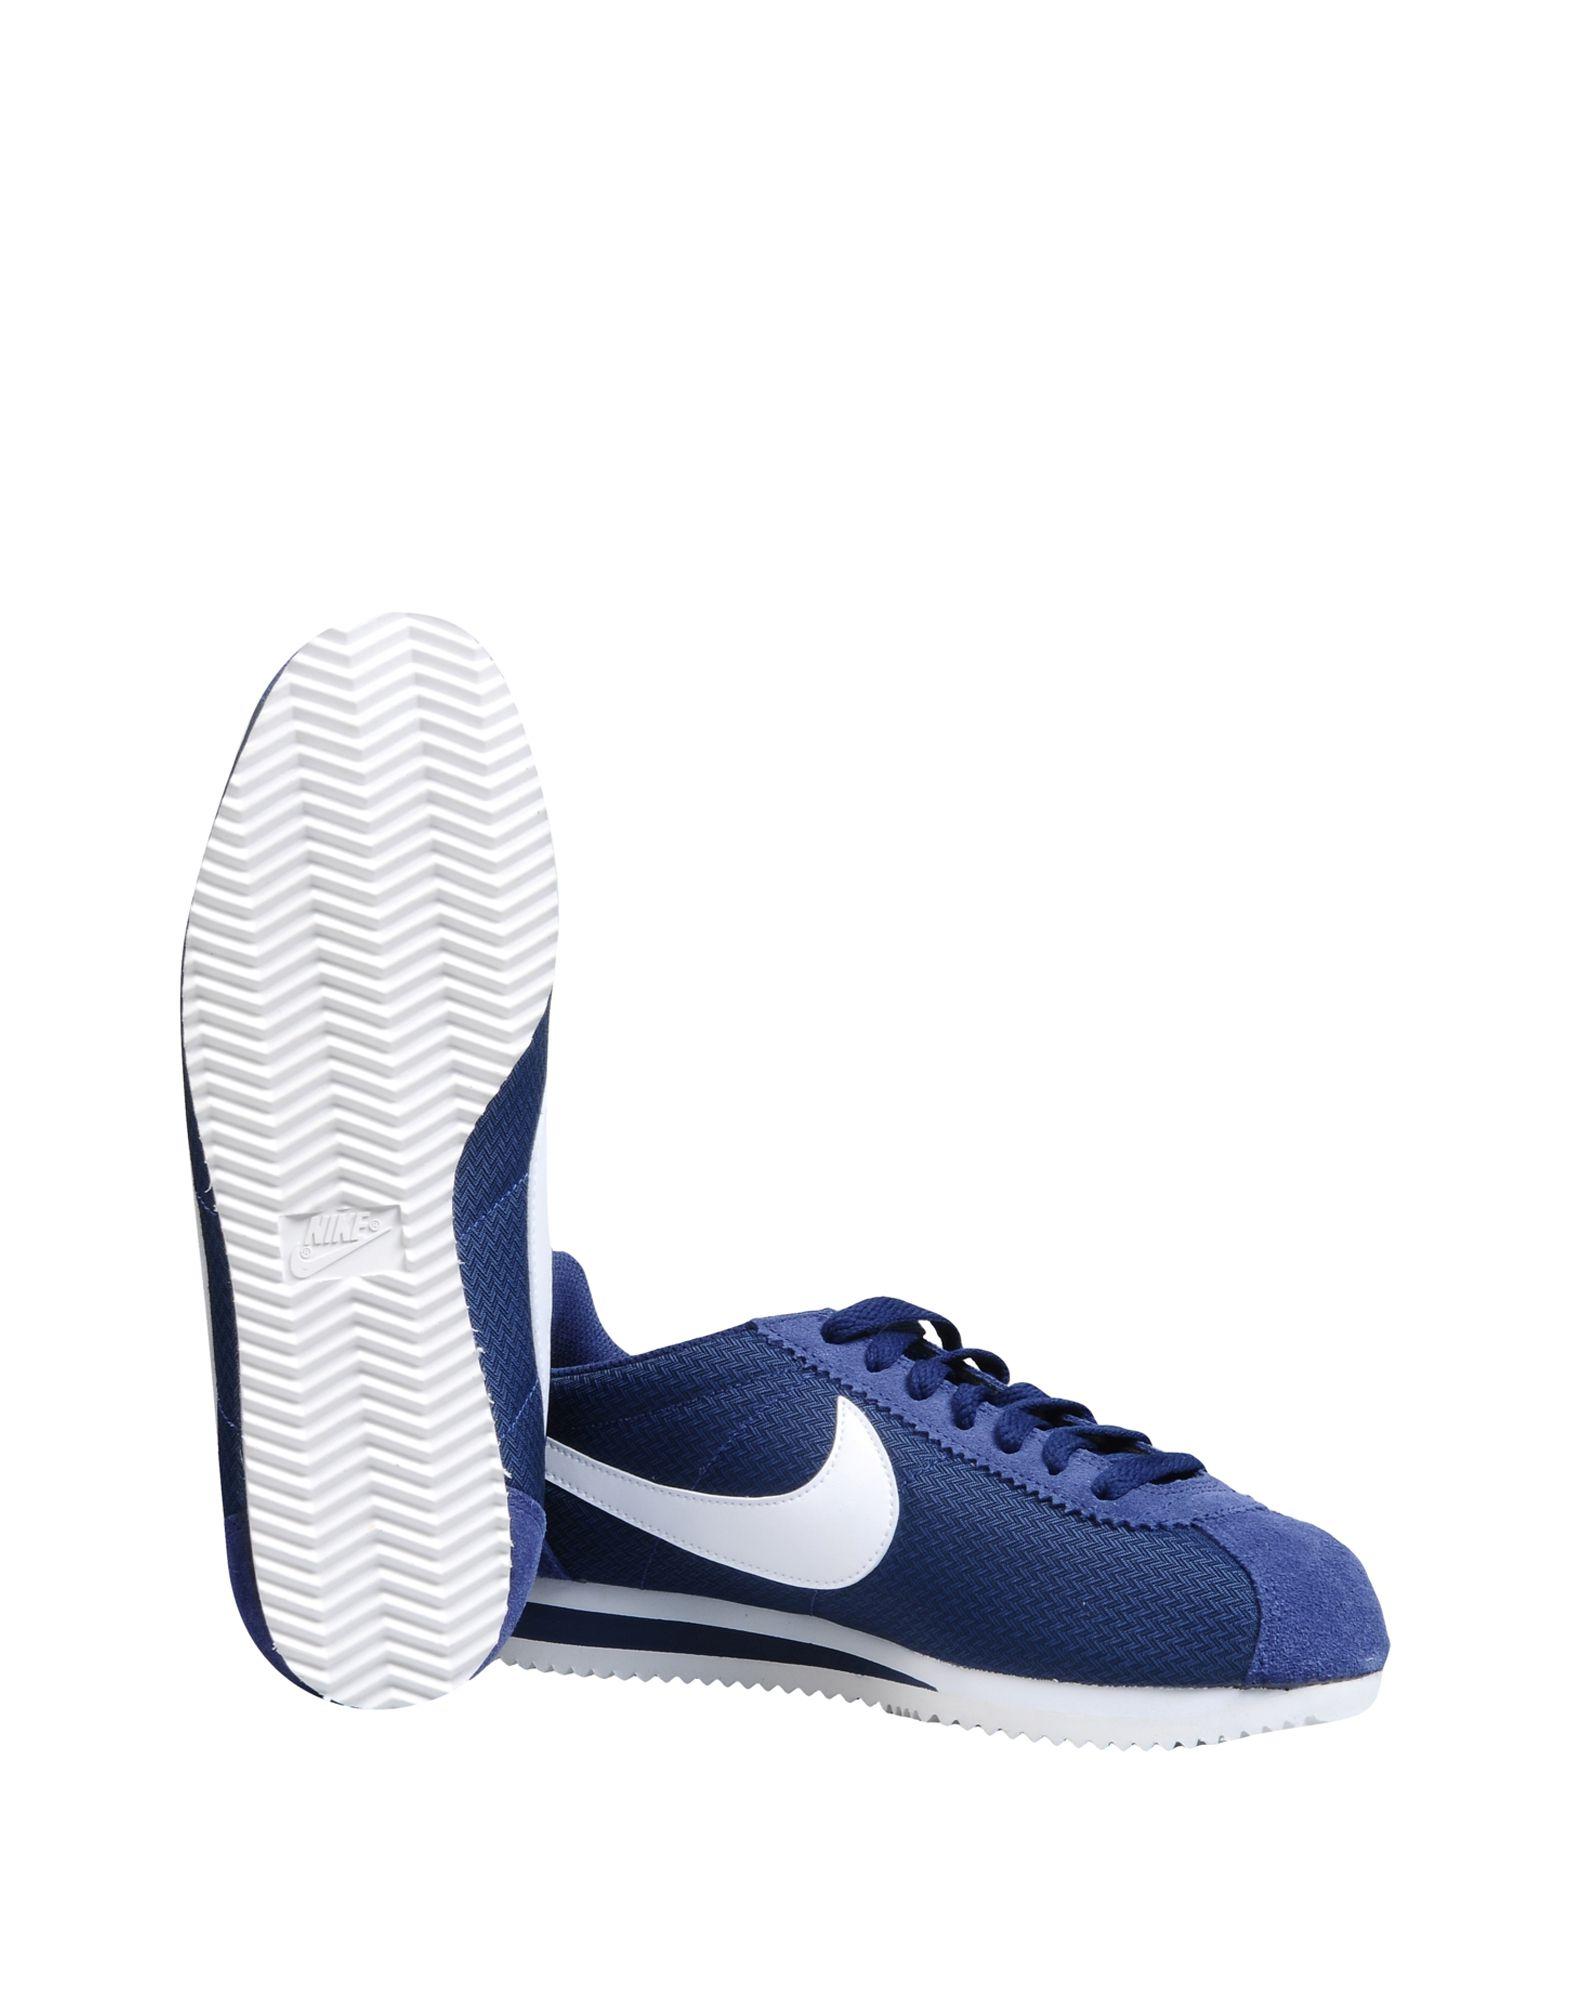 Sneakers Nike Wmns Classic Cortez Nylon - Femme - Sneakers Nike sur